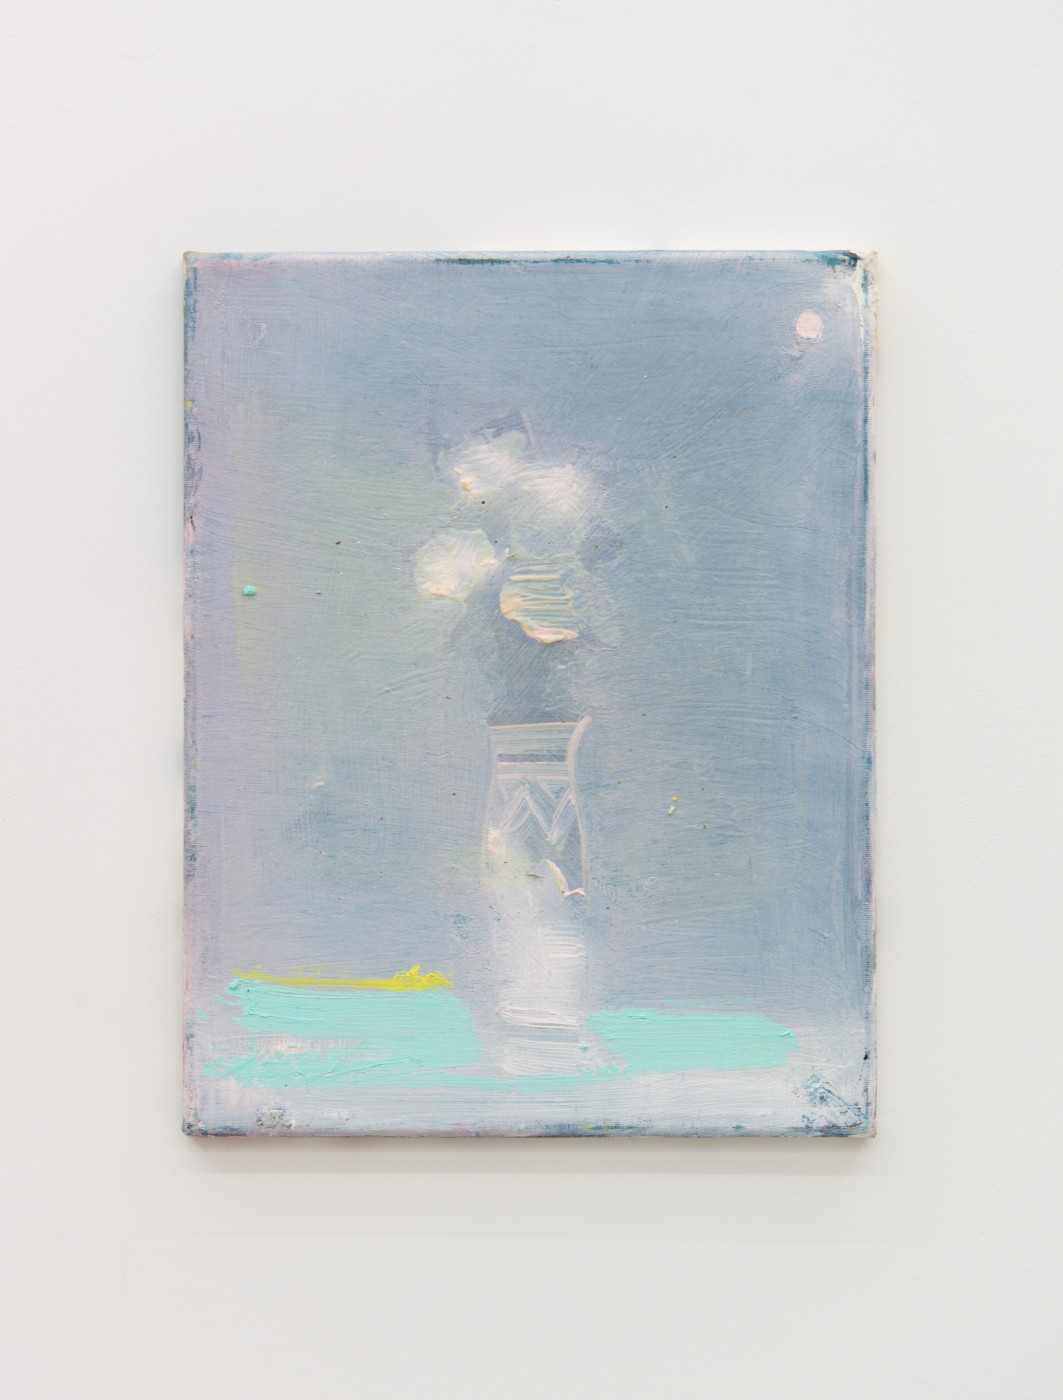 WALLFLOWERS, MALFLOWERS  Small Flower 9 , 2018  Oil on canvas   35 x 27,5 cm / 14 x 11 in  Nathan Zeidman